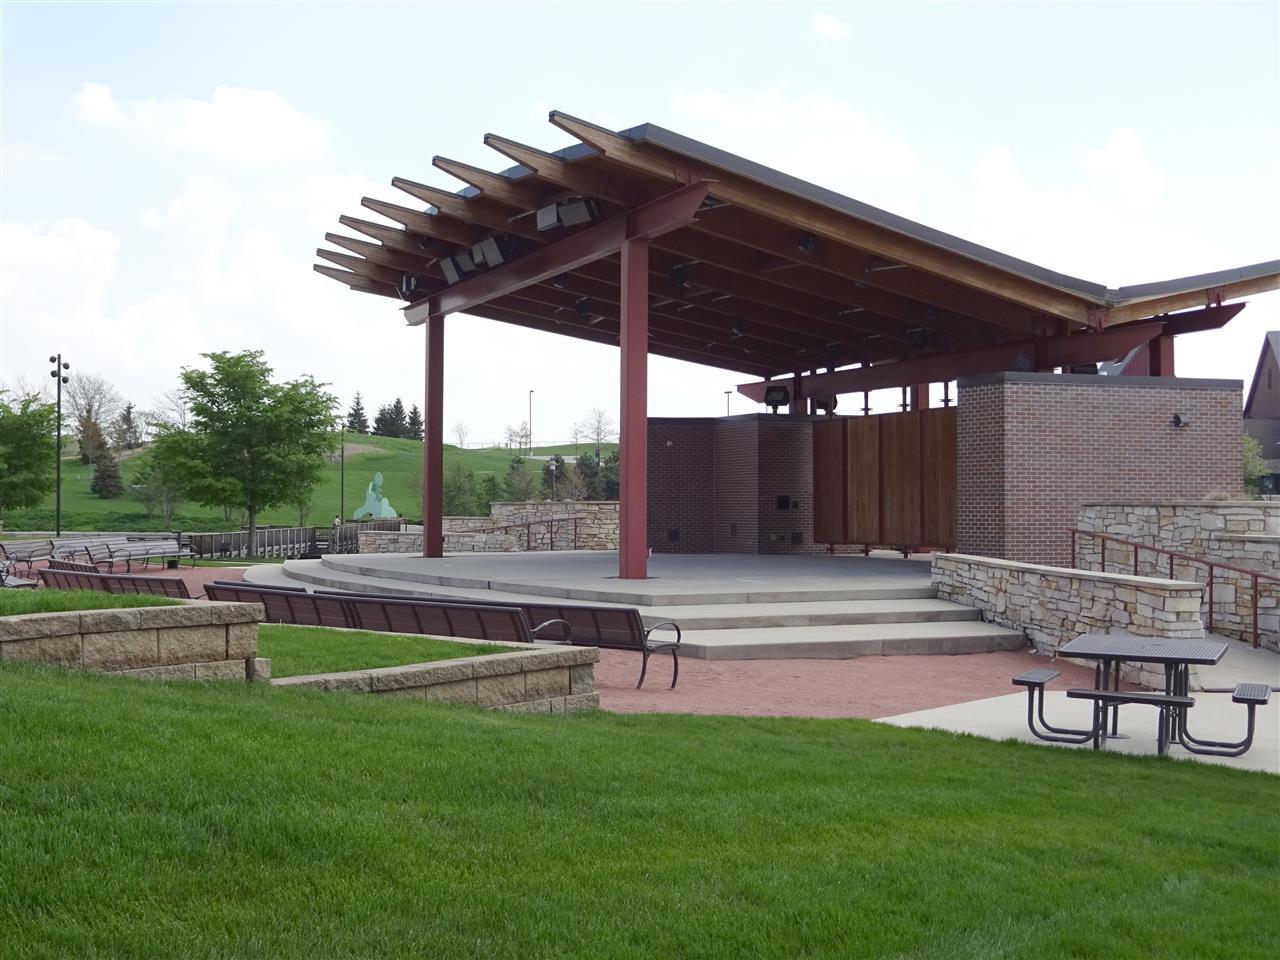 Centennial Park Concert Band-shell in Munster, Indiana